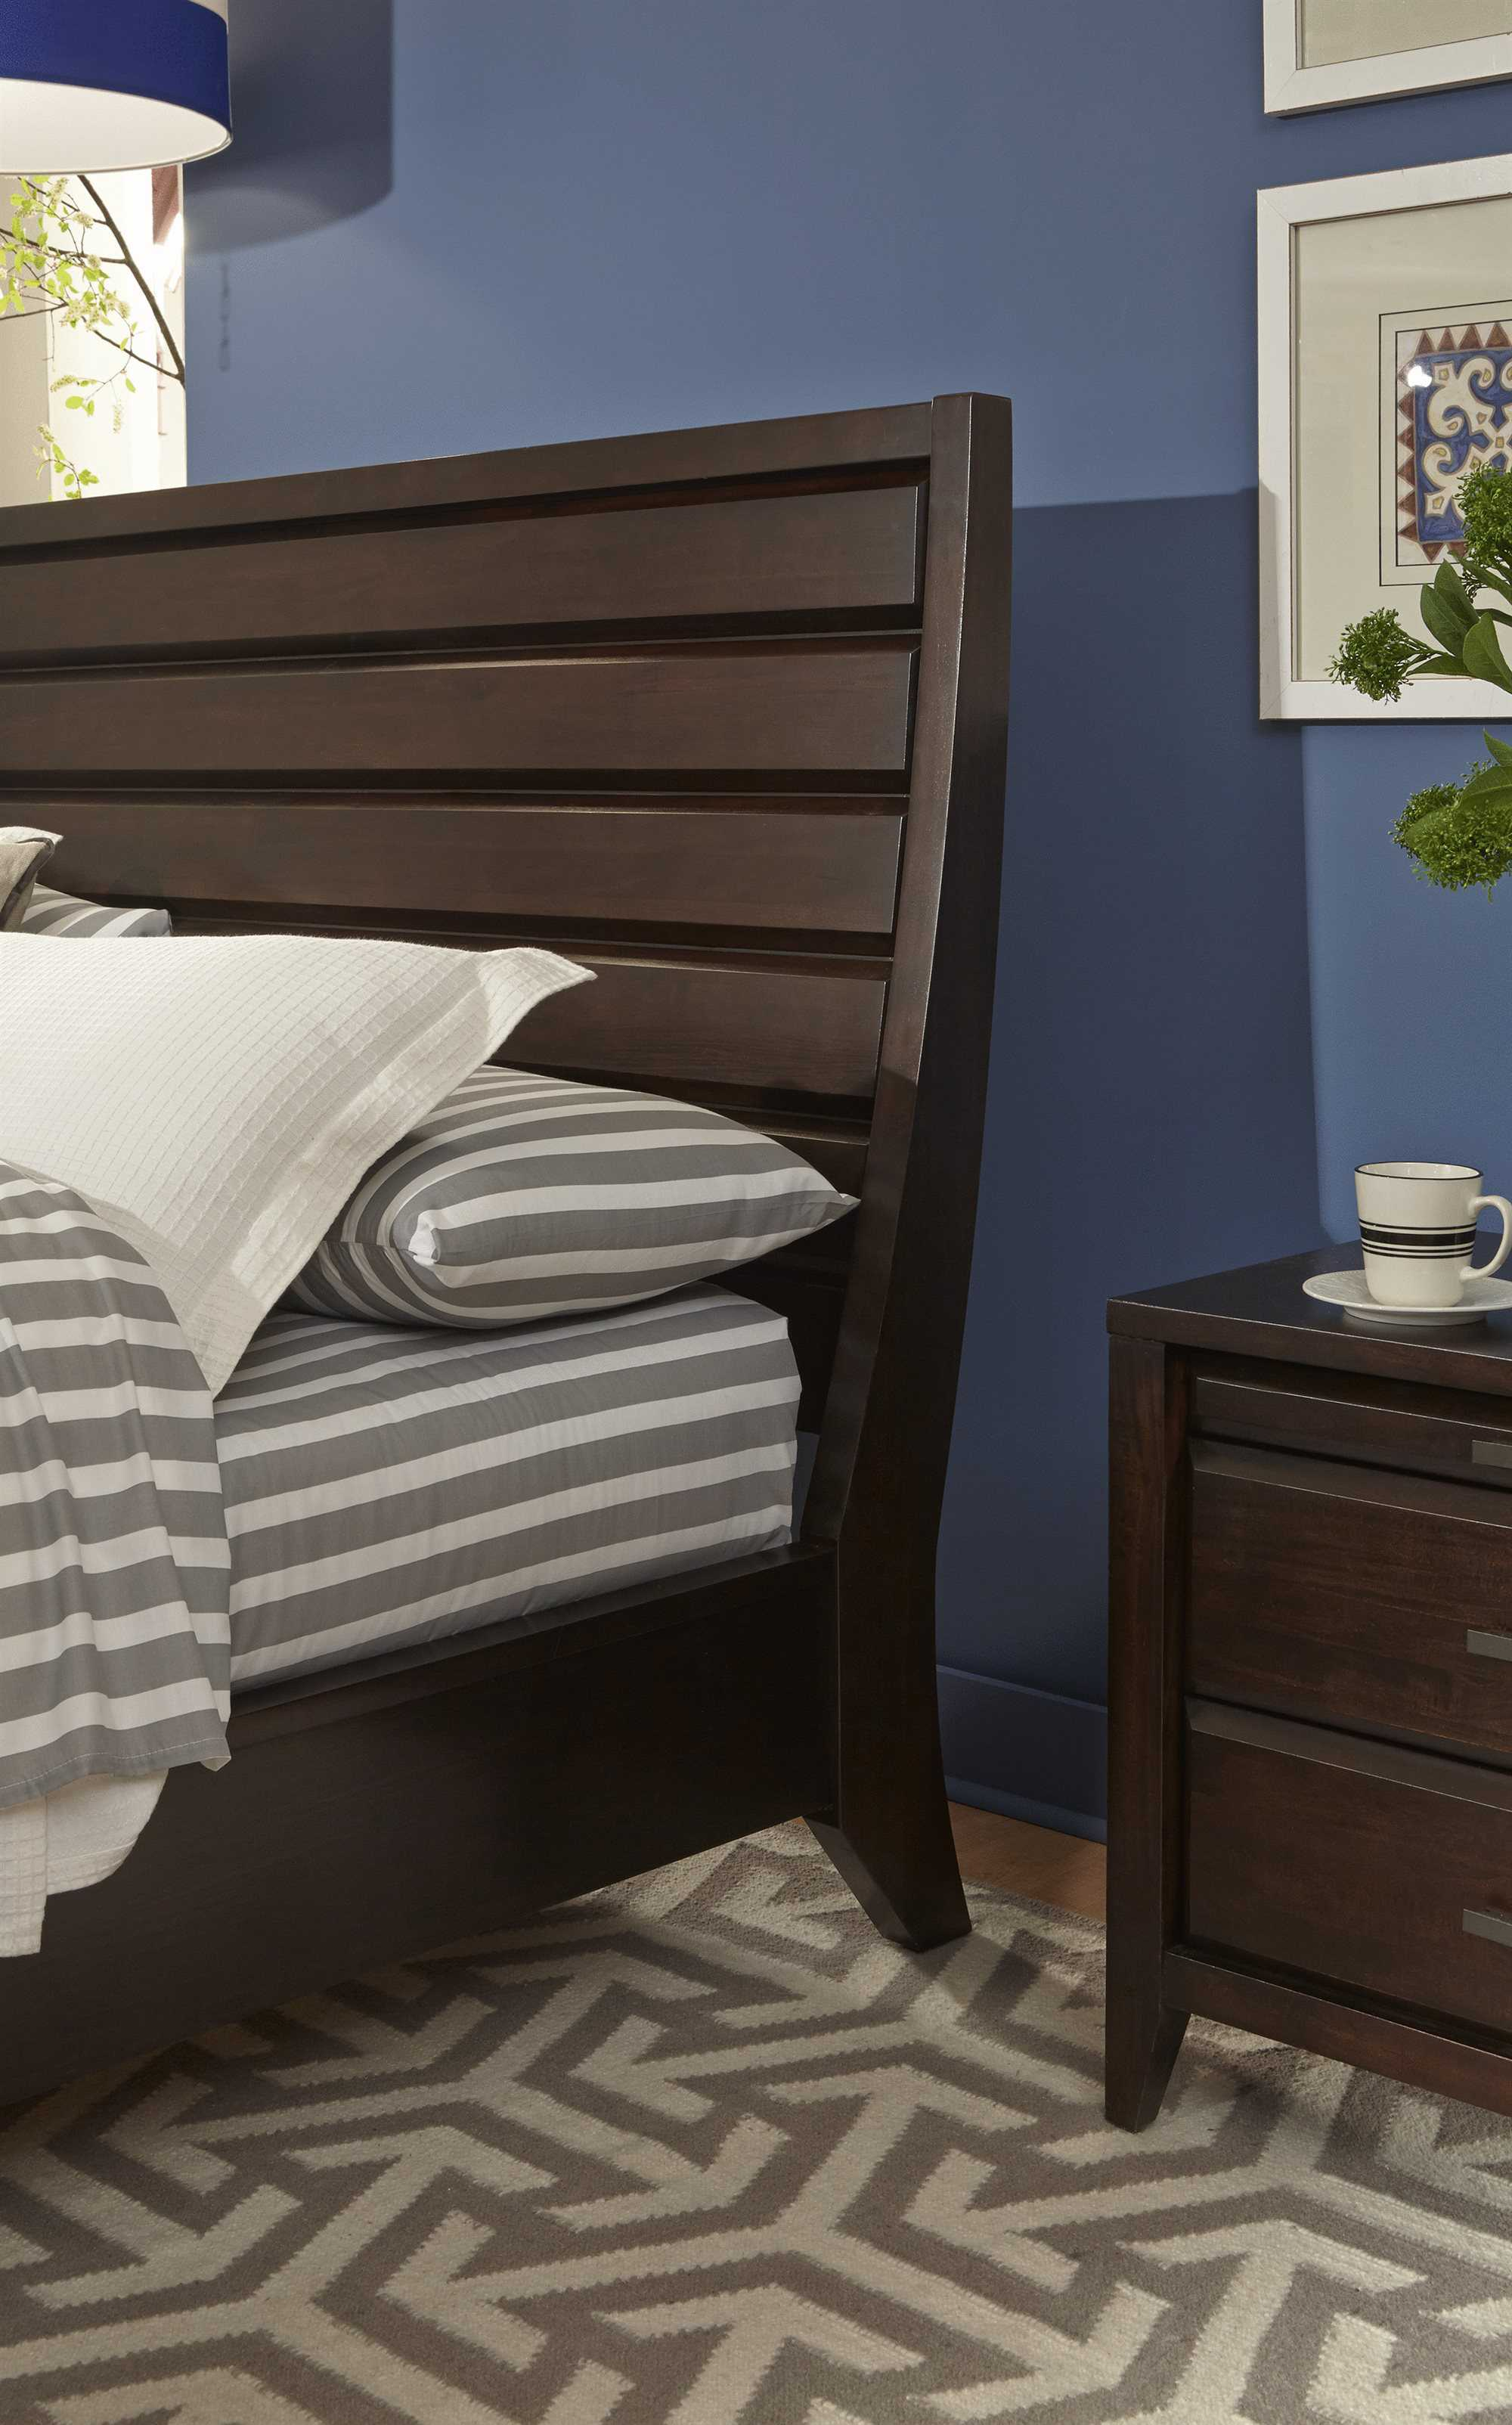 Casana Kendall Bedroom Set 161900kqset2